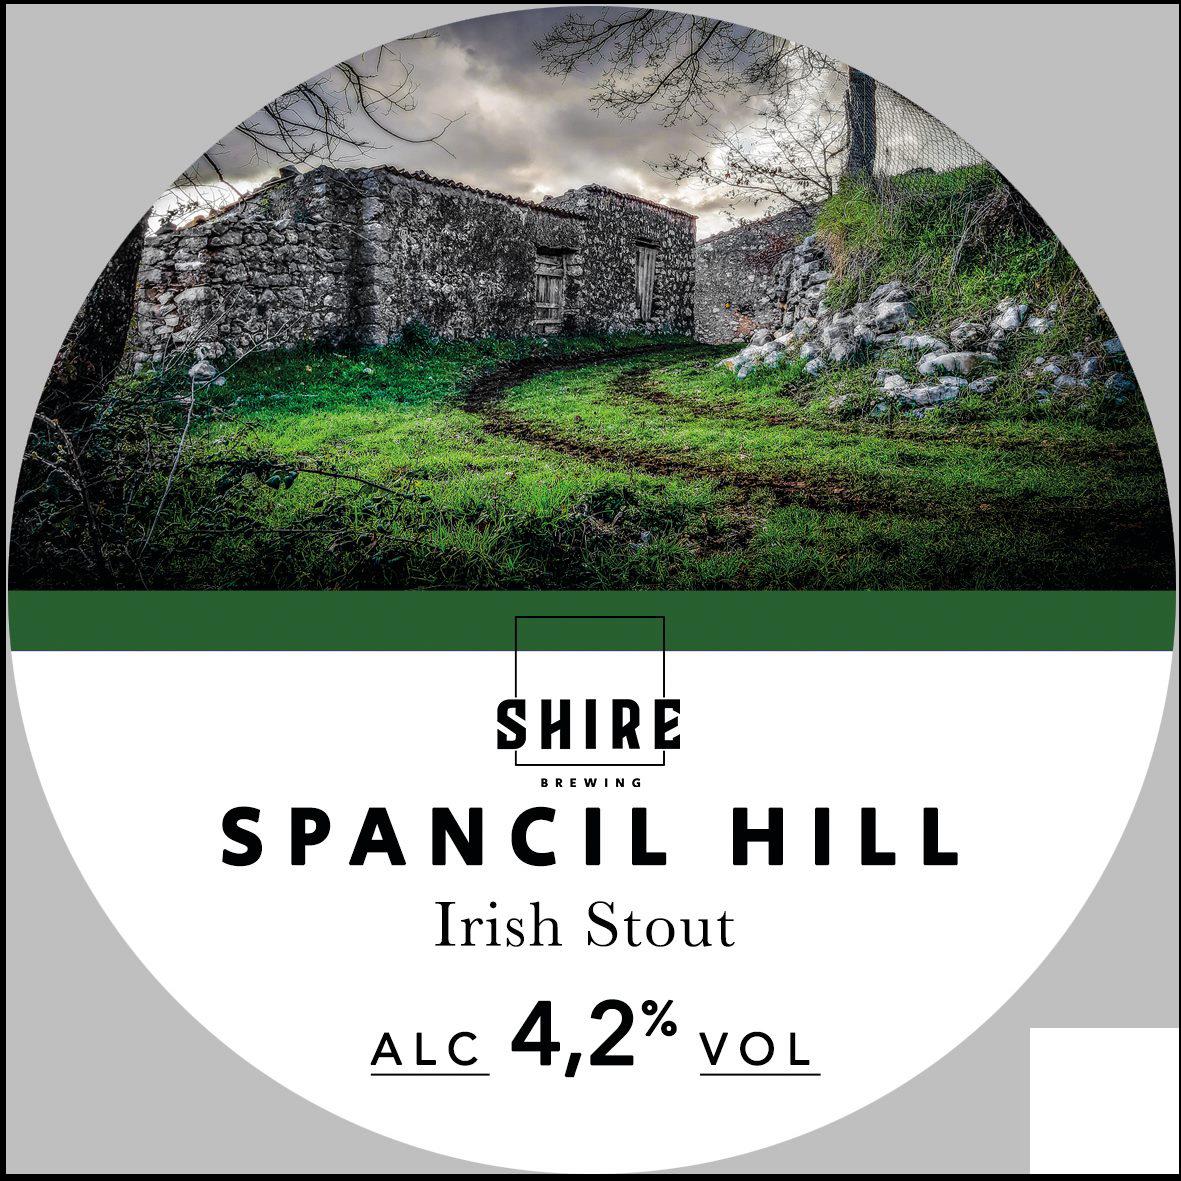 shire spancil hill